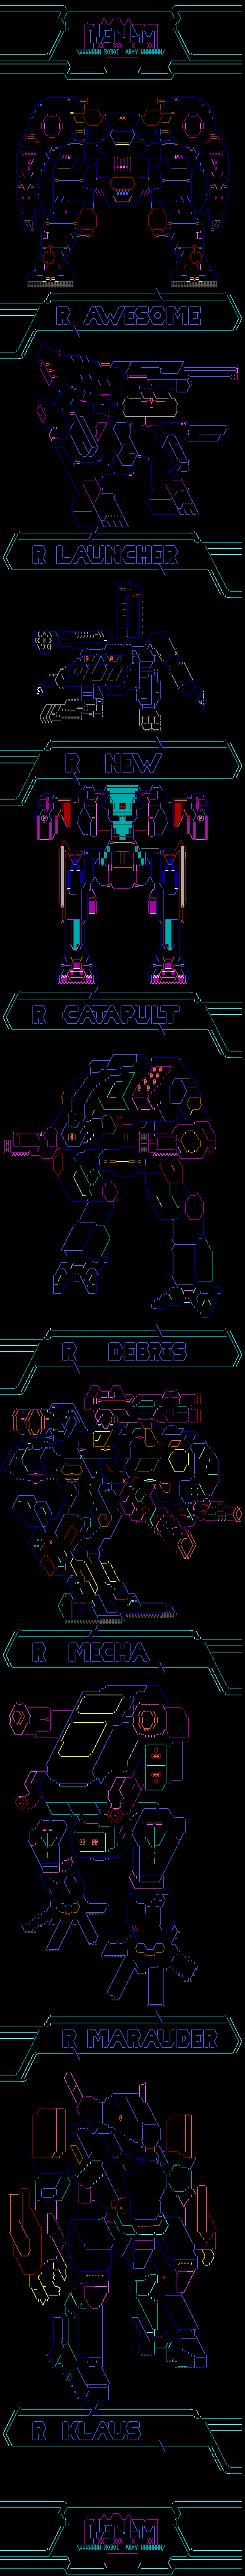 [Image: venam_robot_army.png]